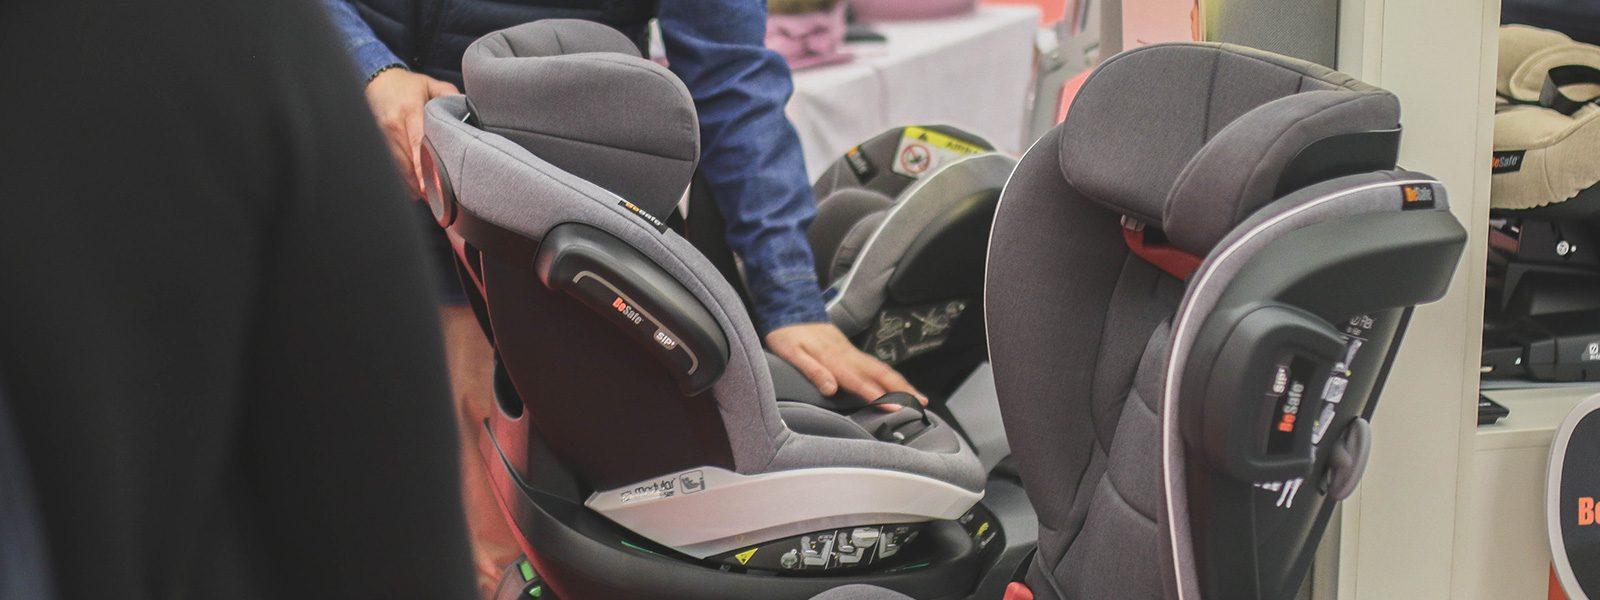 Kindersitz wählen